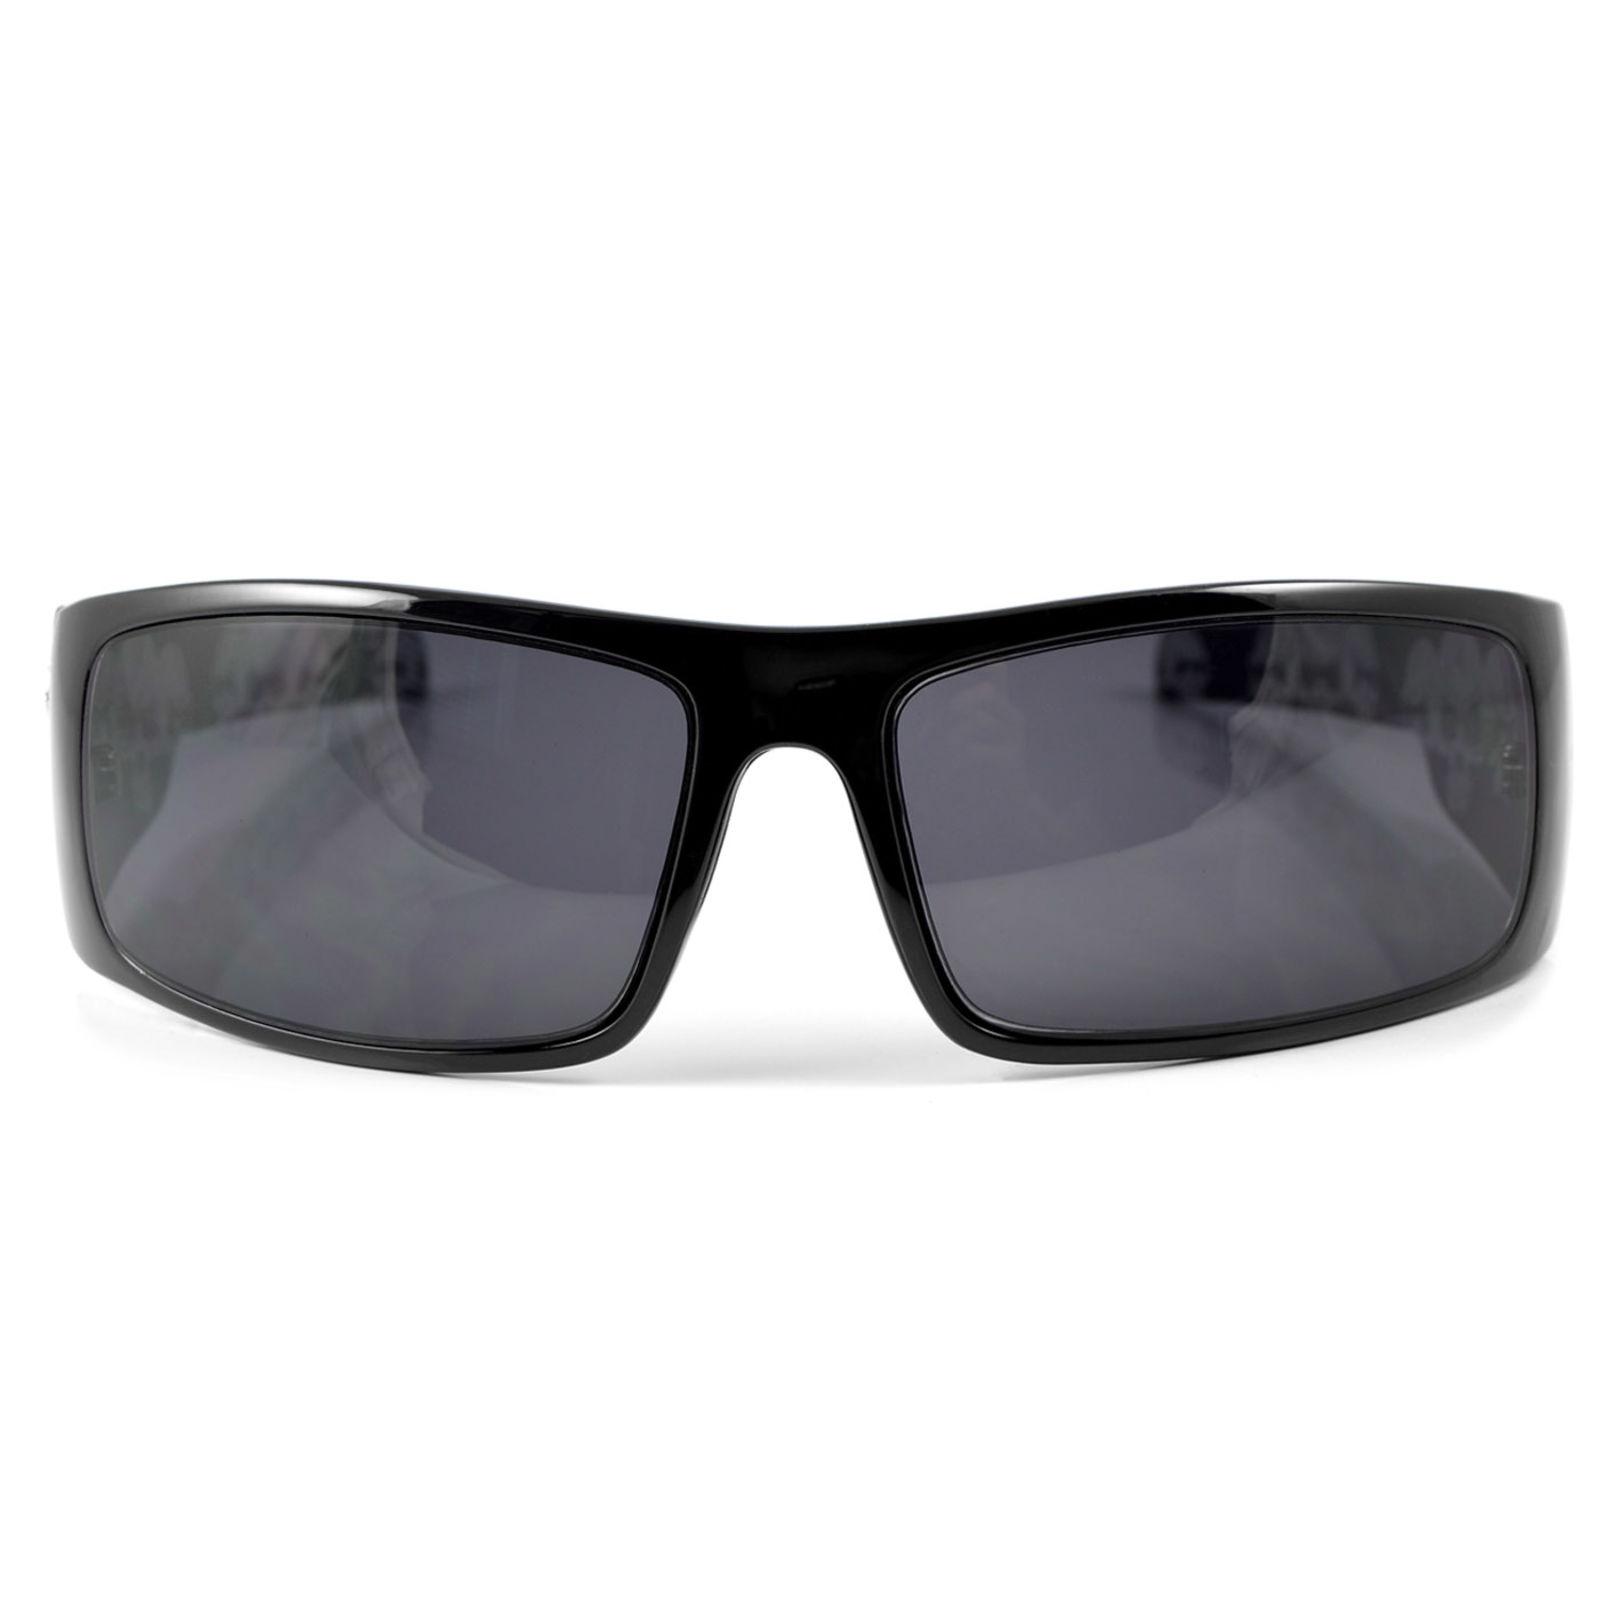 Occhiali da sole Locs da motociclista con teschi RTyMLif